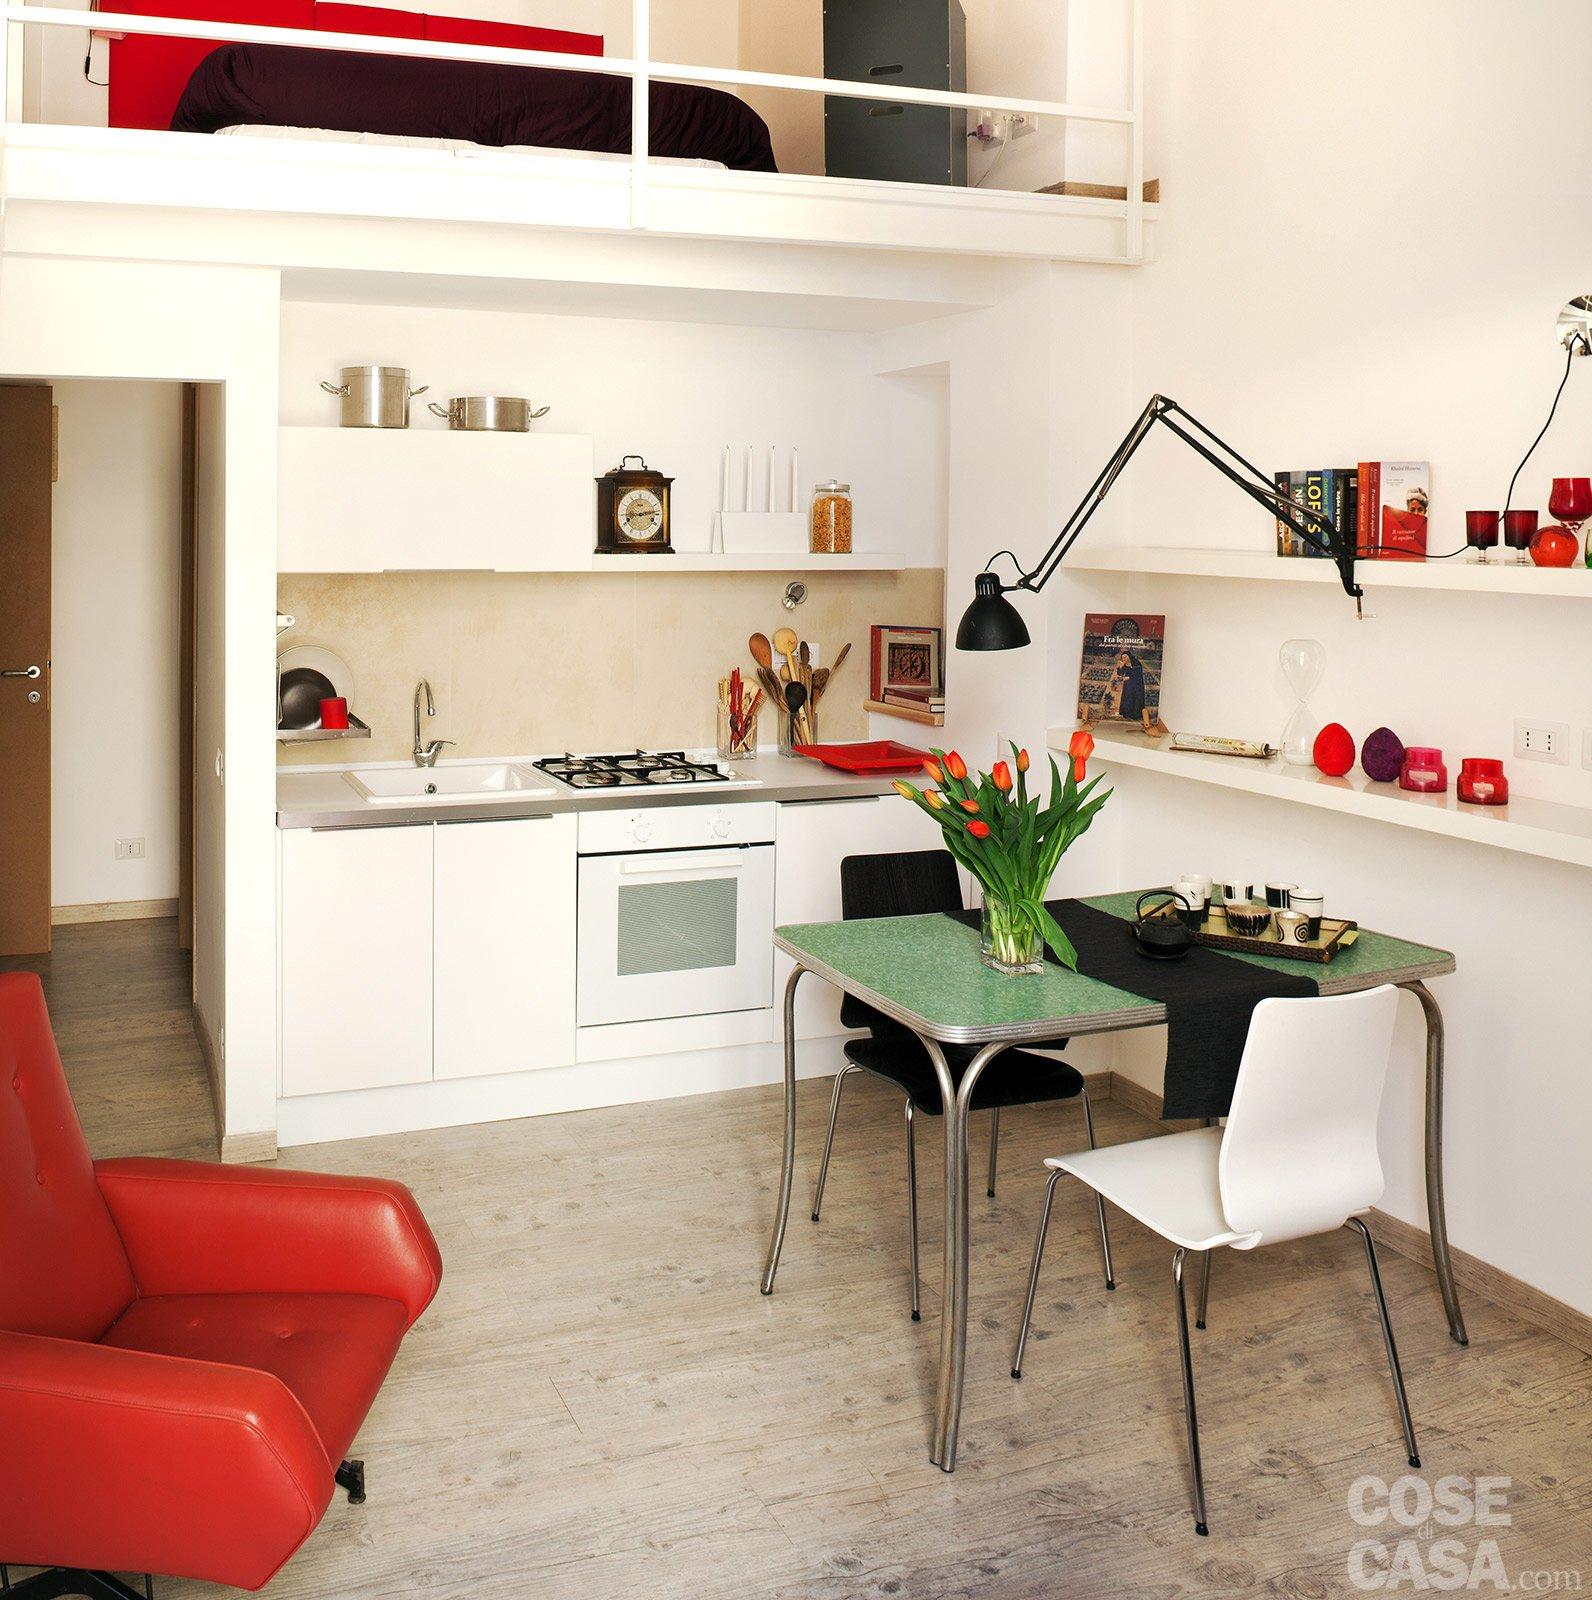 Una casa che punta al risparmio cose di casa - Cucina in casa ...